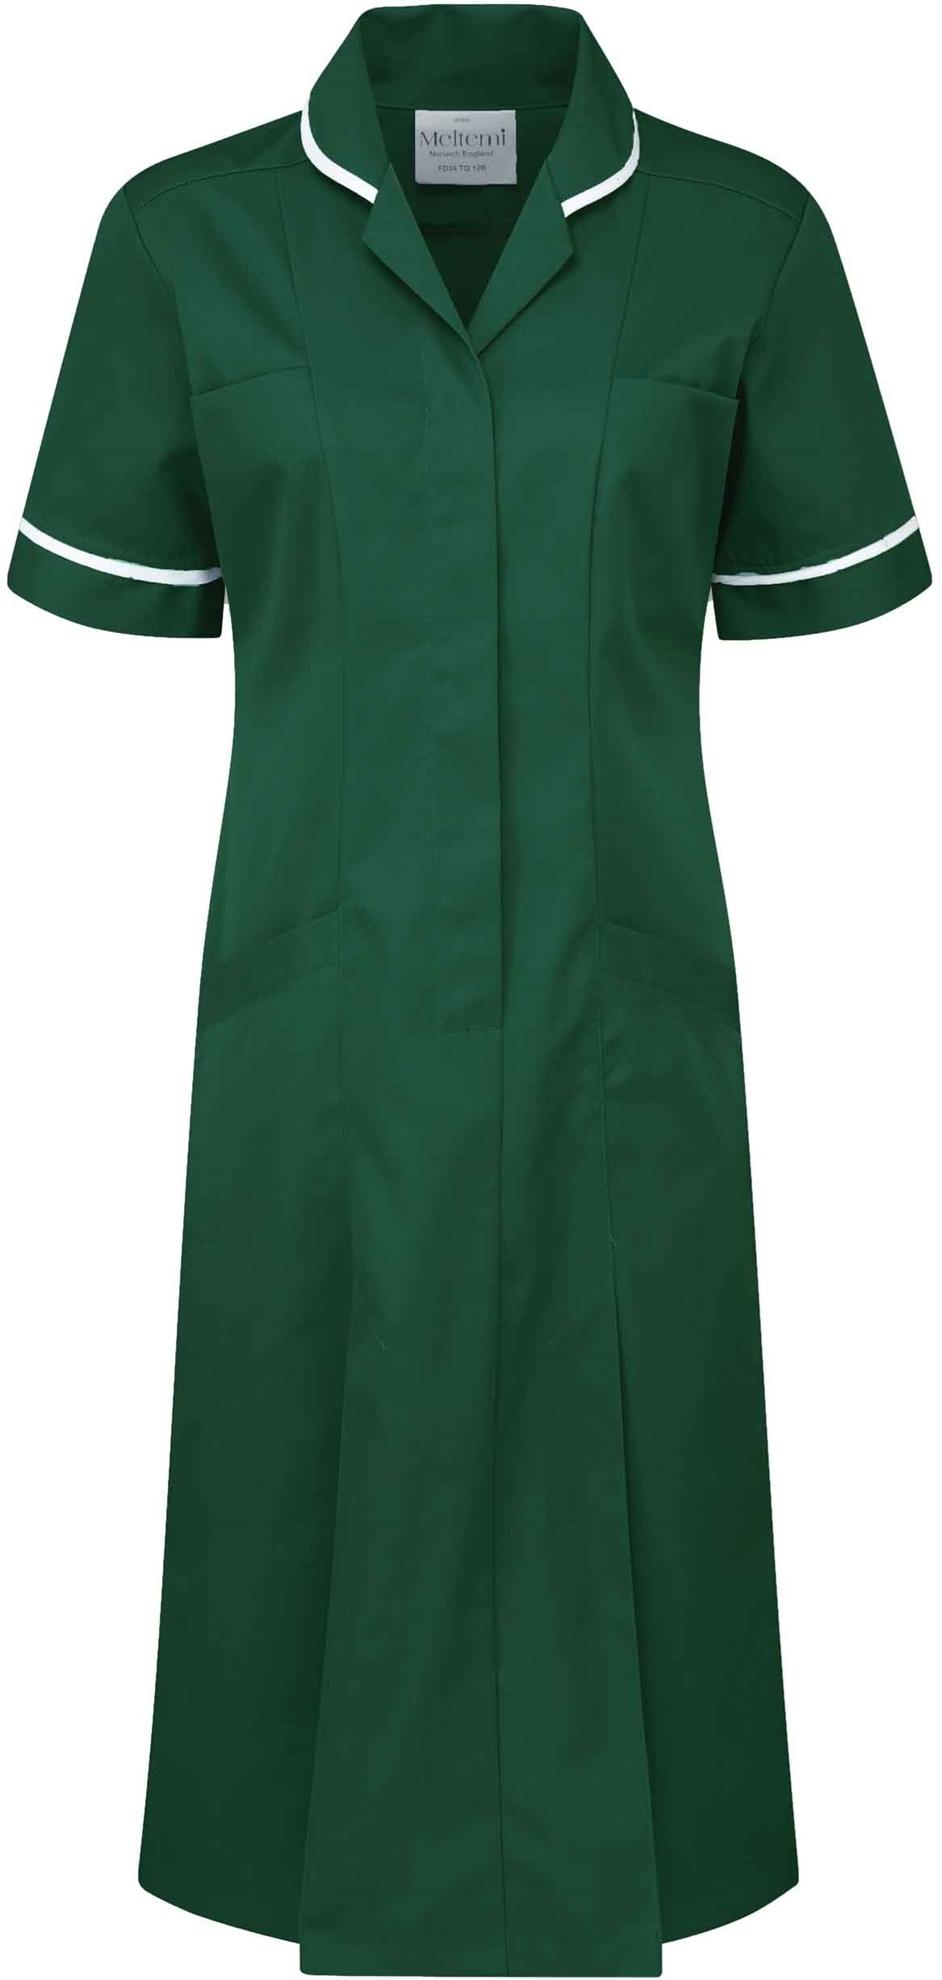 Picture of Advantage Plain Dress - Bottle Green/White